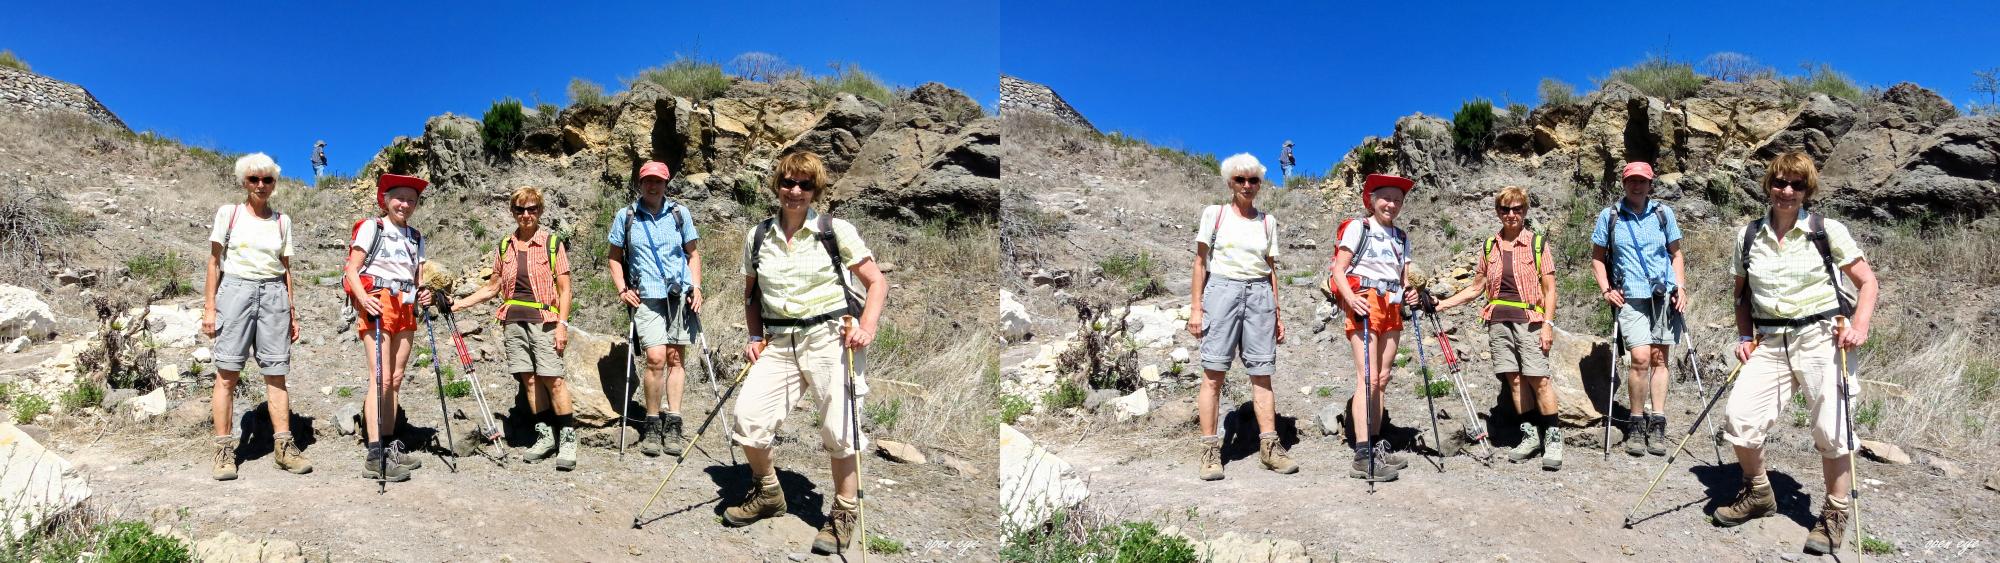 Wandern auf der Insel La Gomera